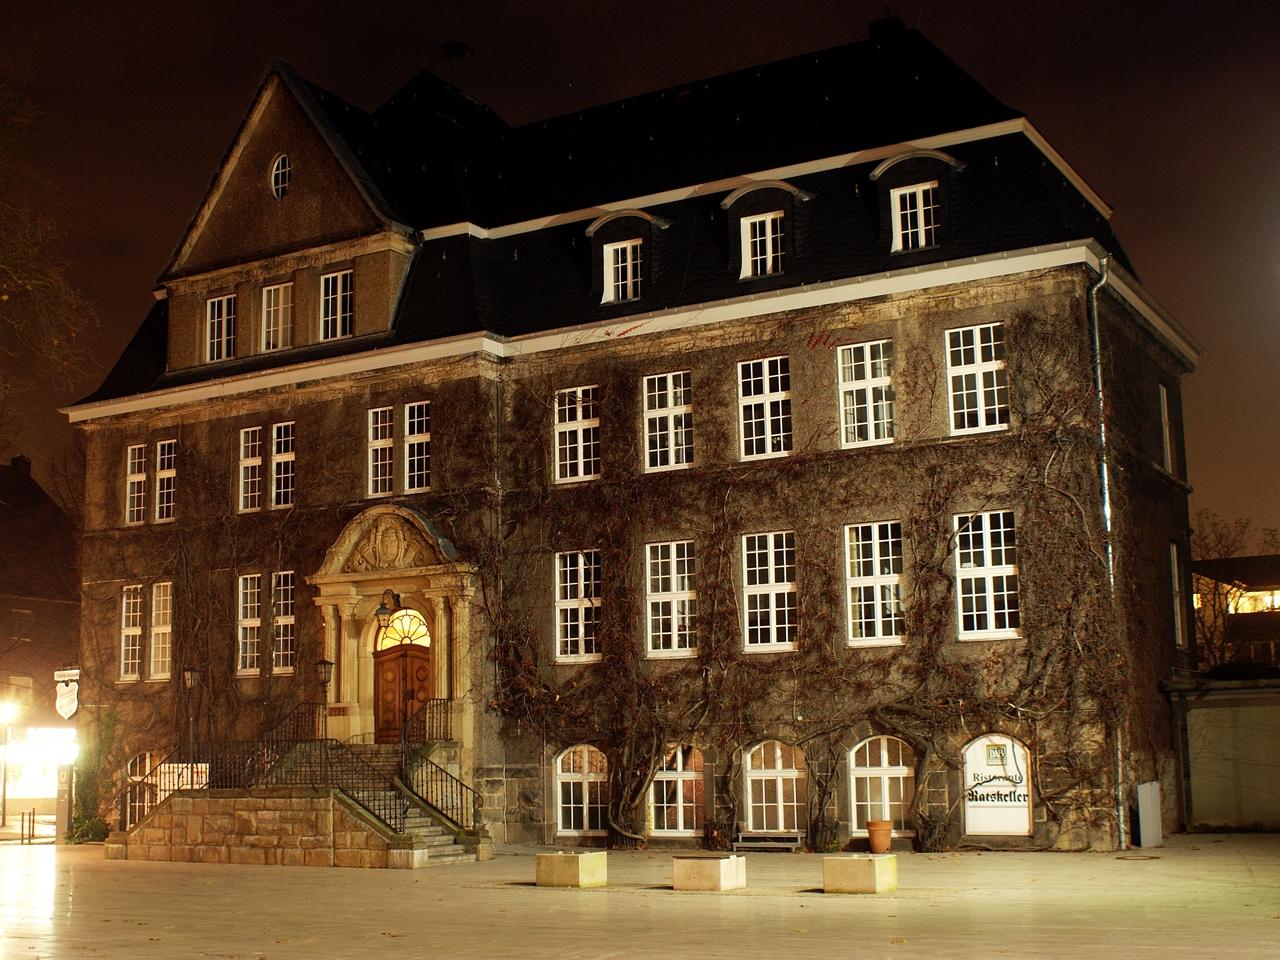 Holzwickeder Rathaus